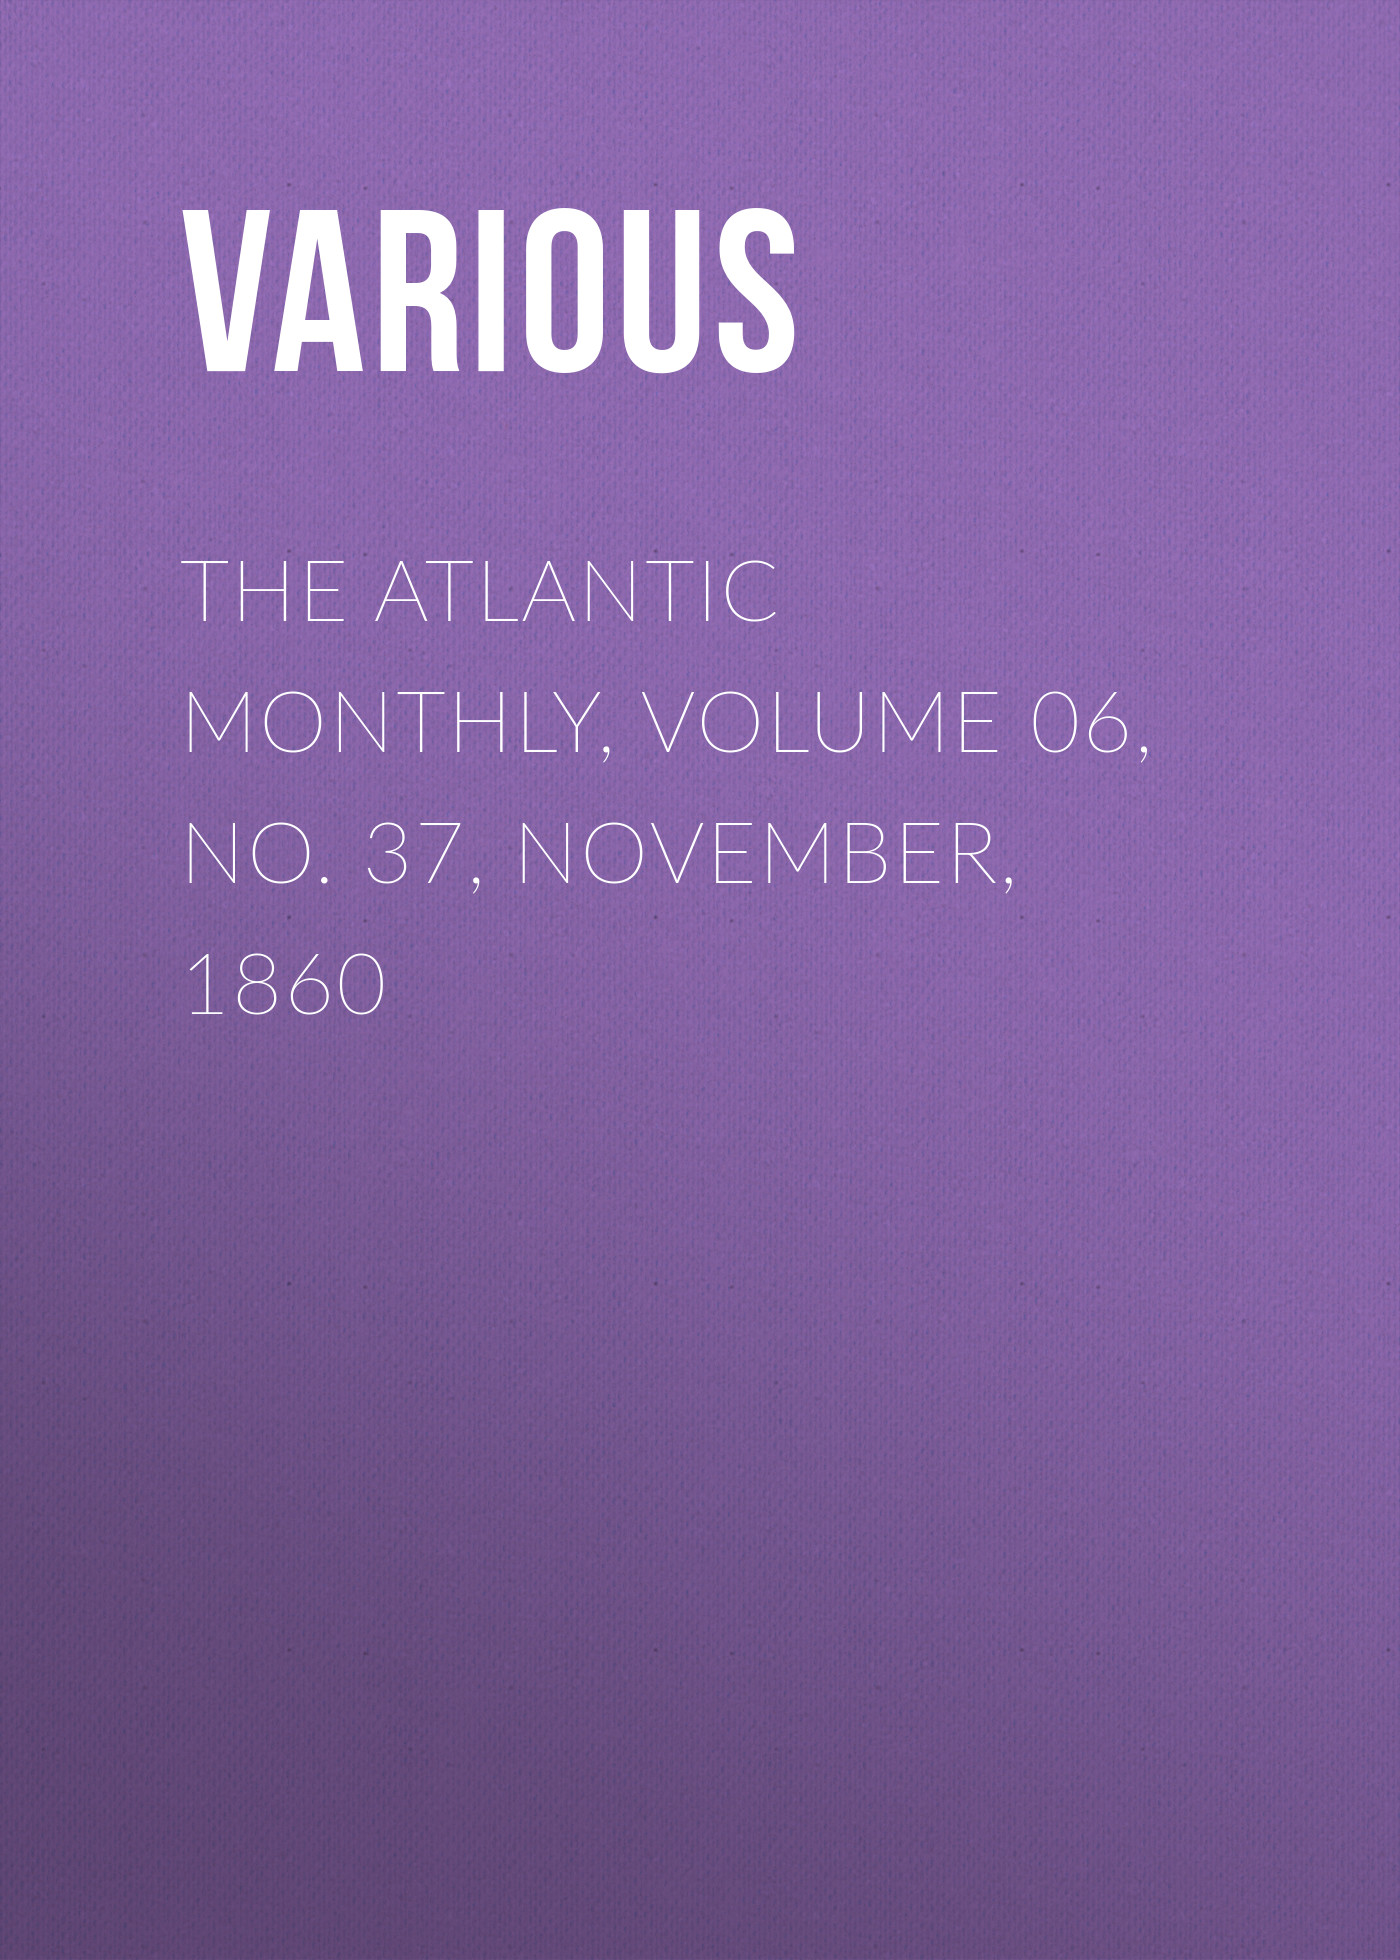 Various The Atlantic Monthly, Volume 06, No. 37, November, 1860 the early november toronto